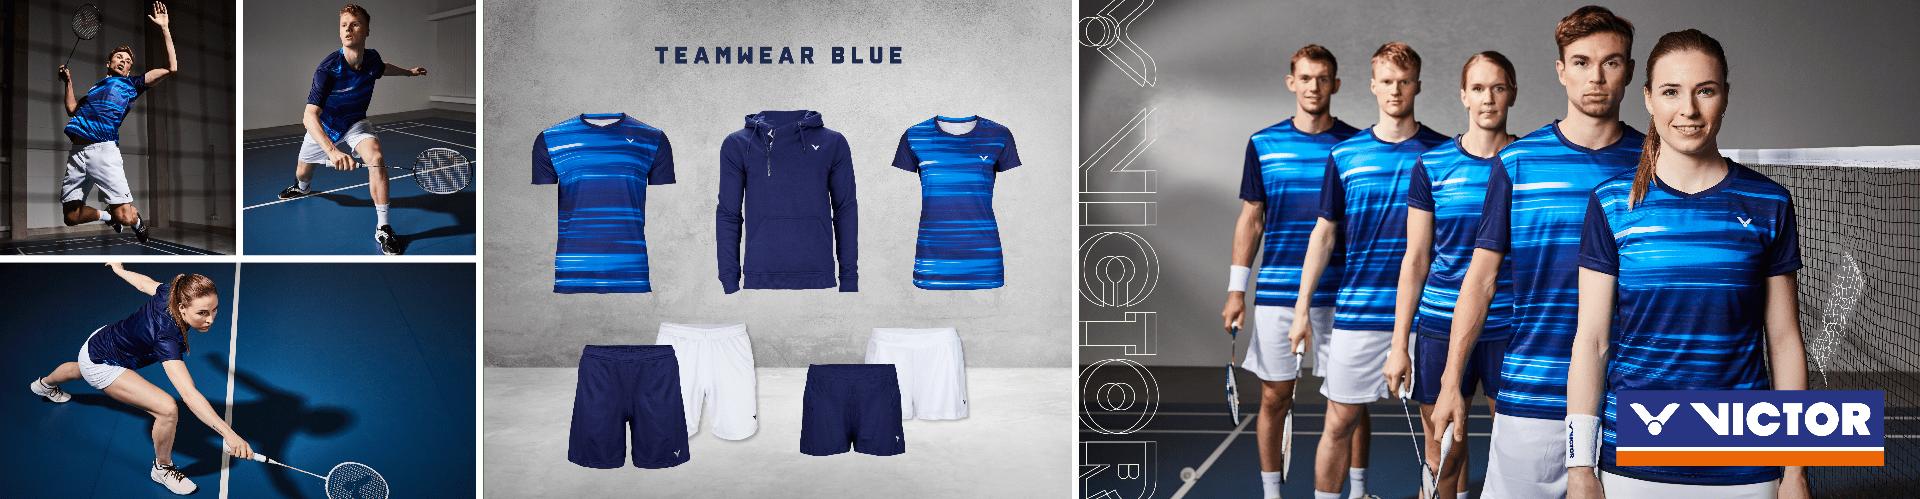 Victor Teamwear Blue 2020